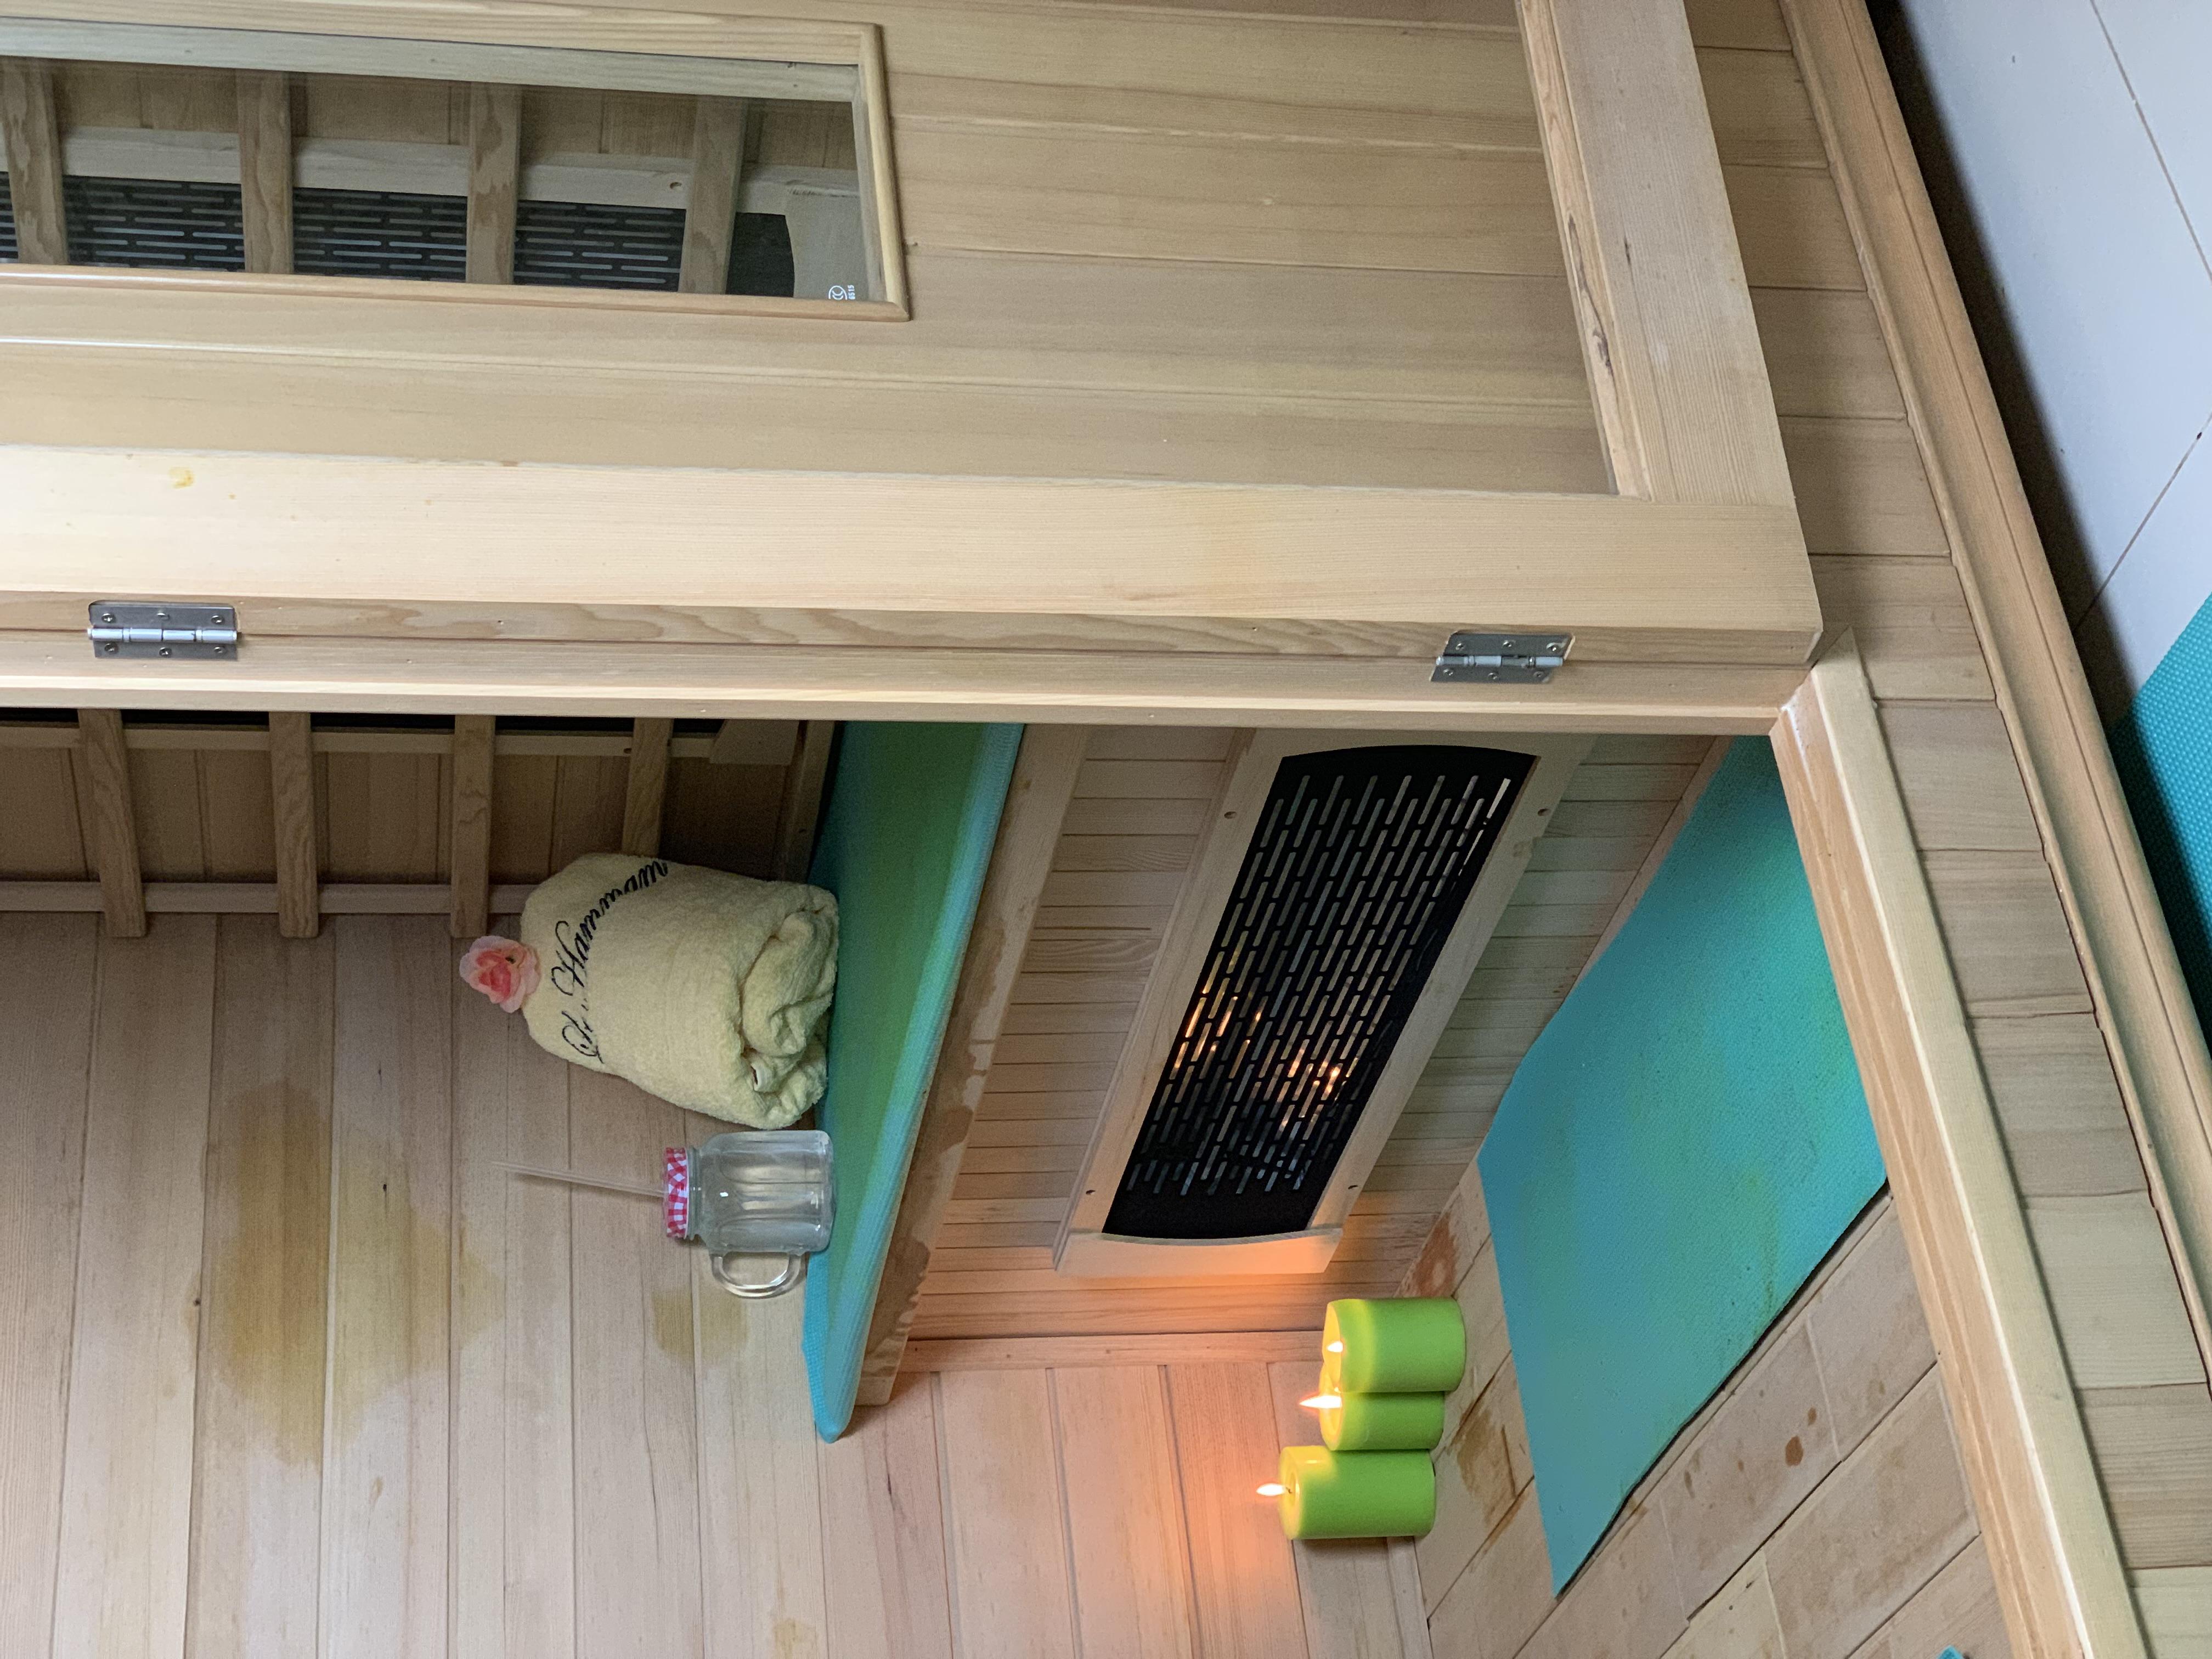 Le Hammam sauna room